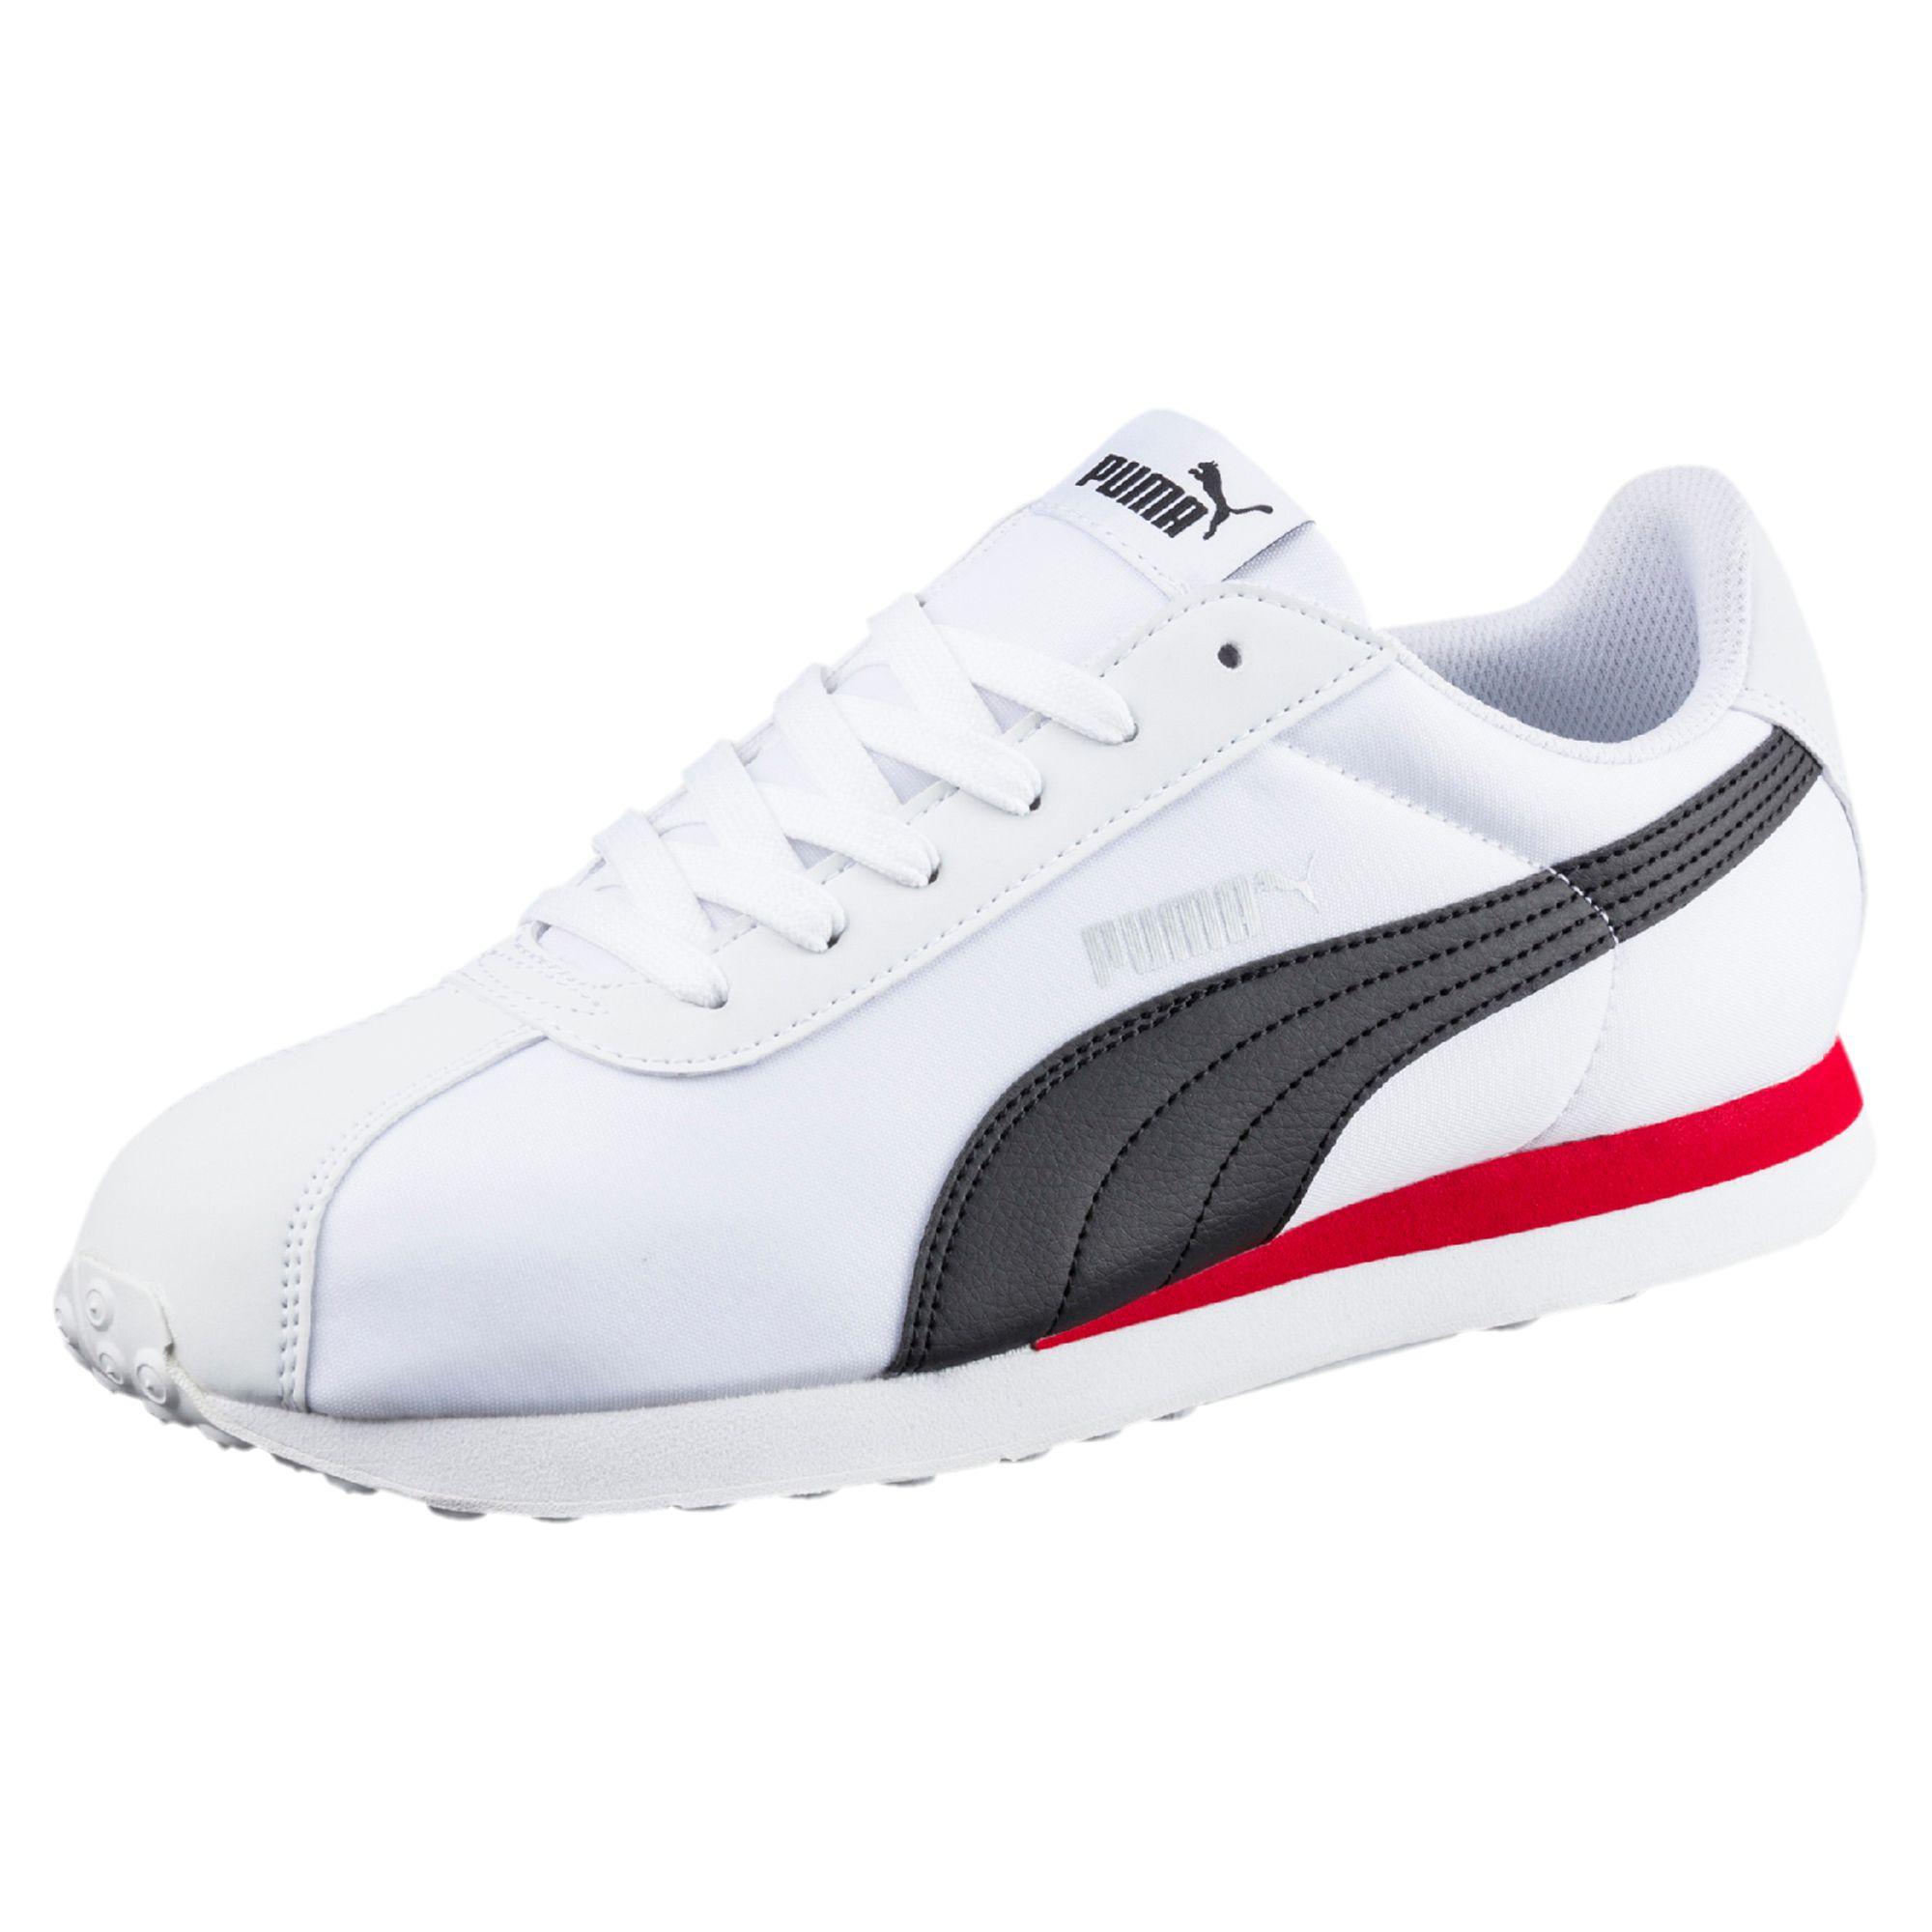 Турин NL кроссовки